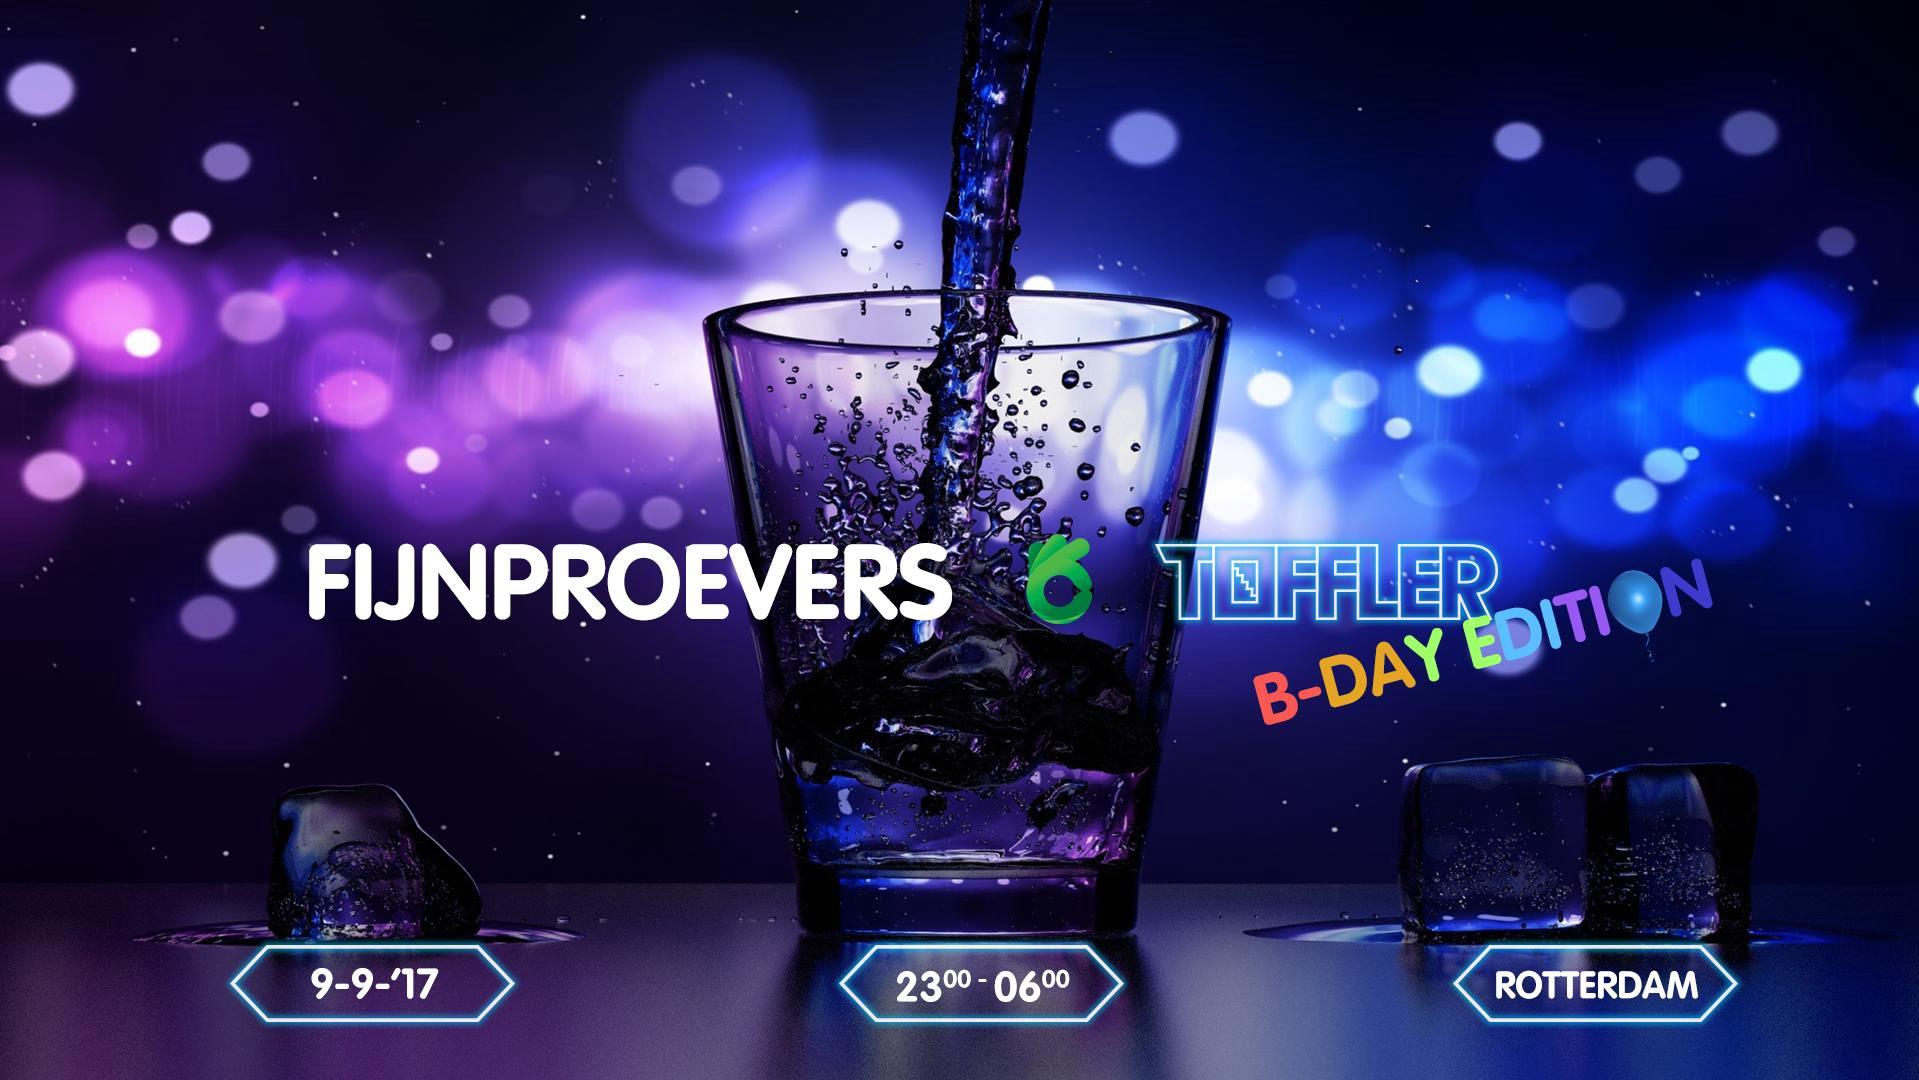 FijnProevers X Toffler Birthday Edition